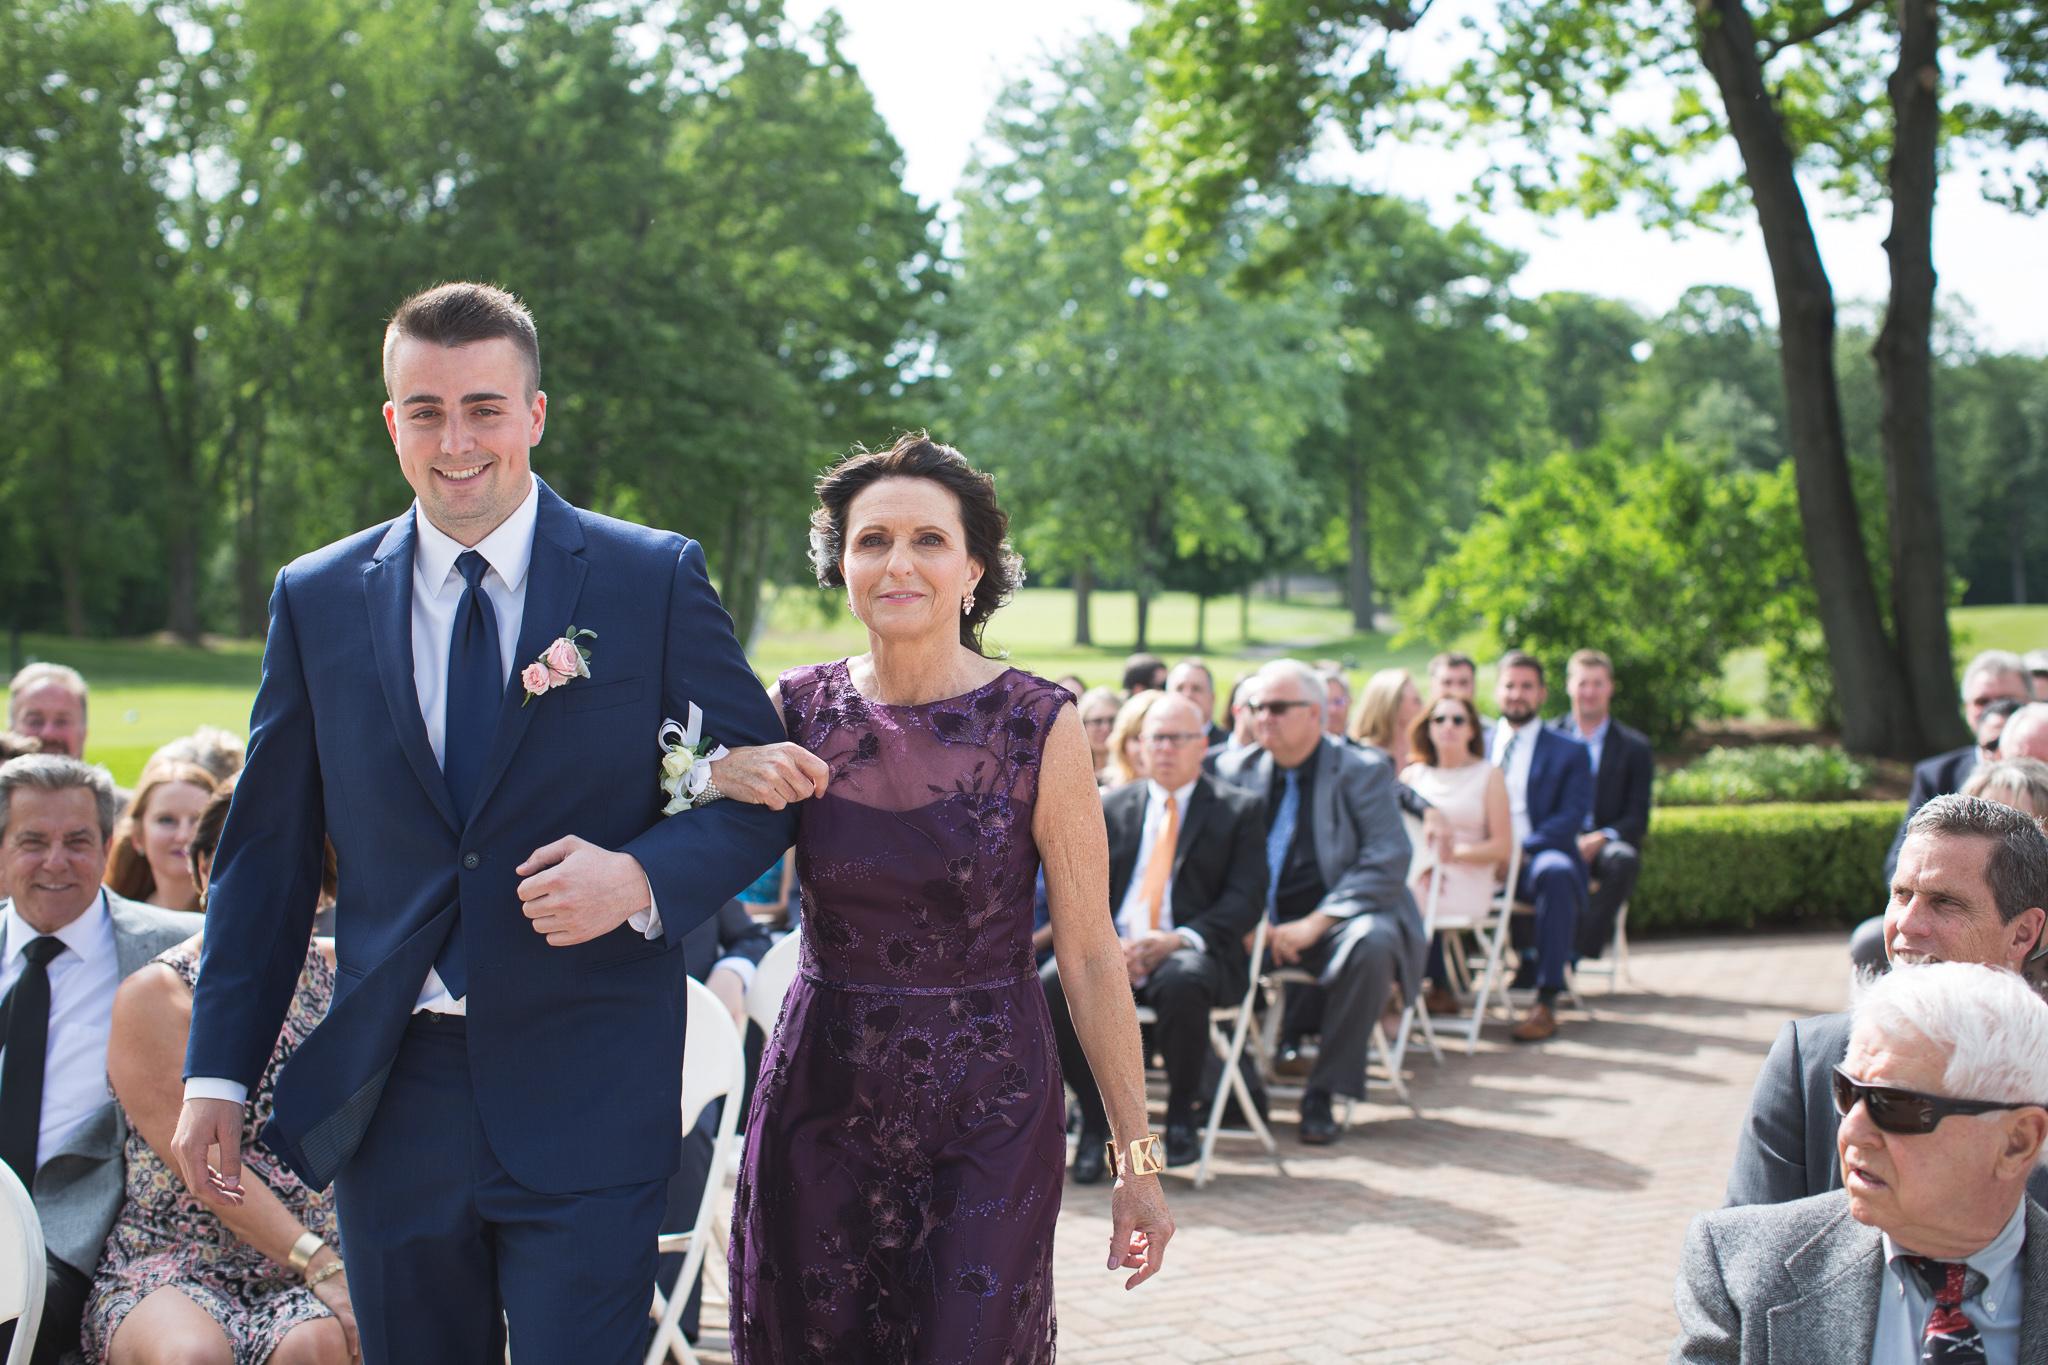 067-best-detroit-michigan-outdoor-wedding-photographer.jpg